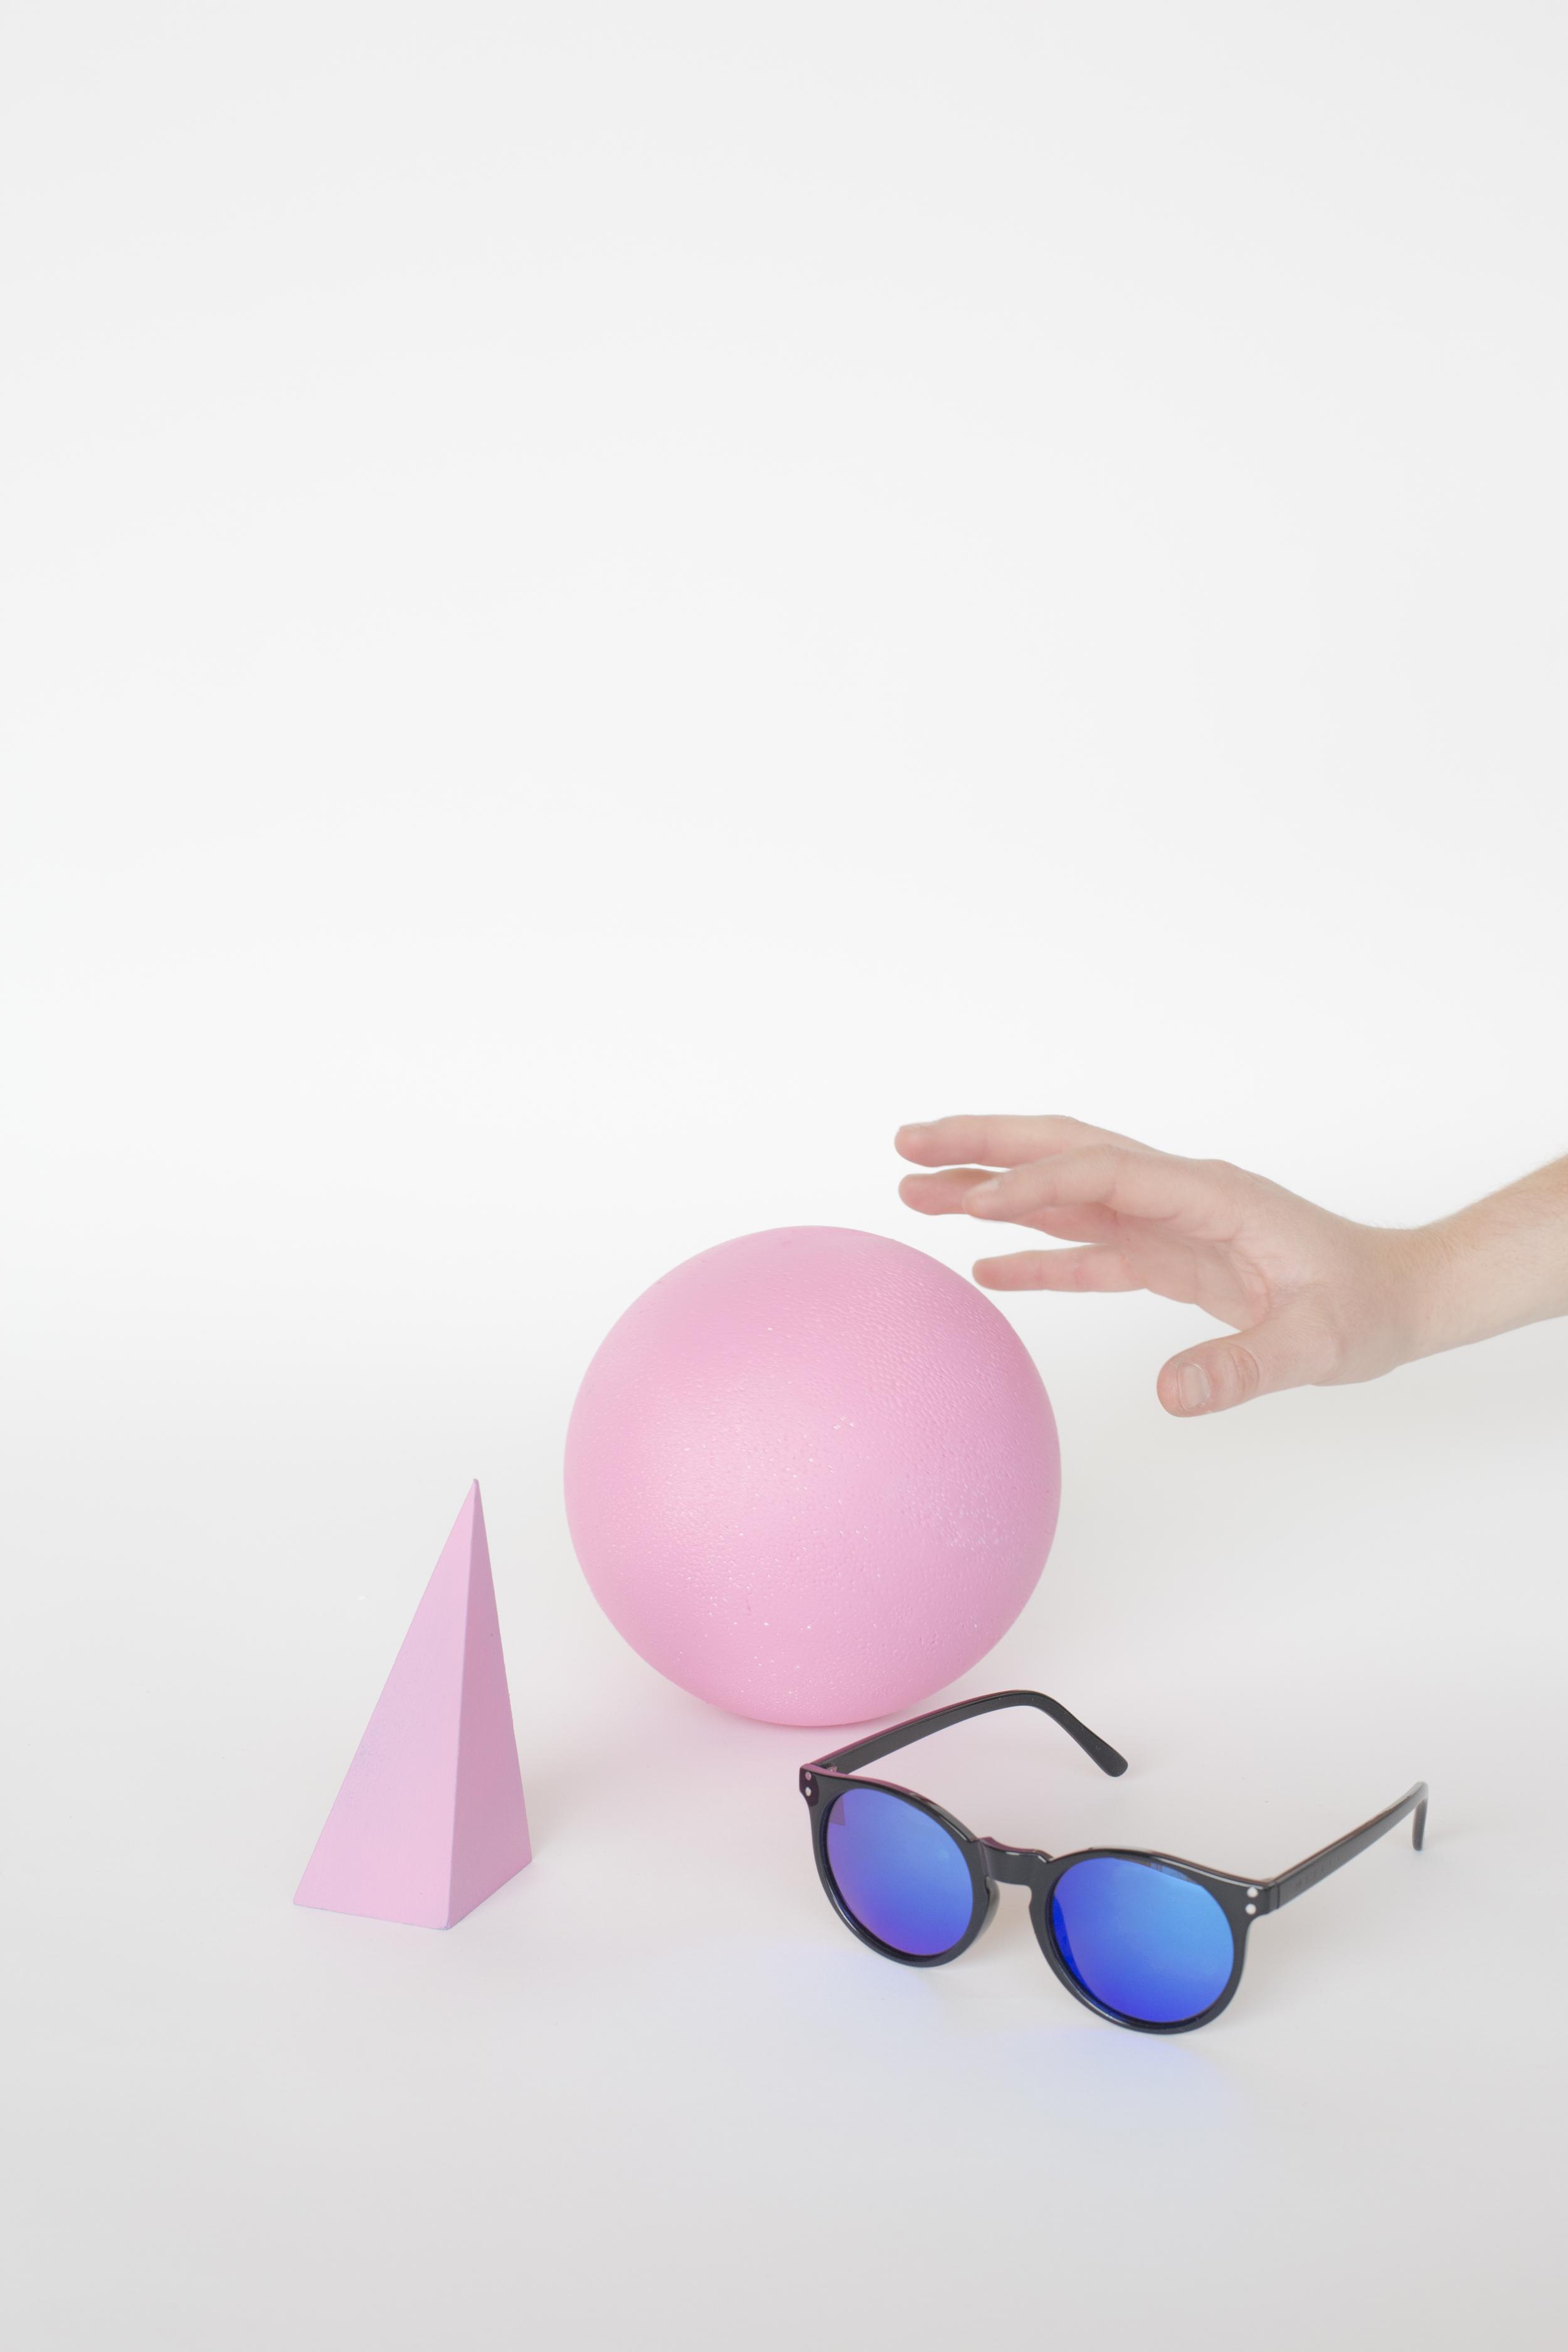 Meller Brand |Sunglasses   Shooting product